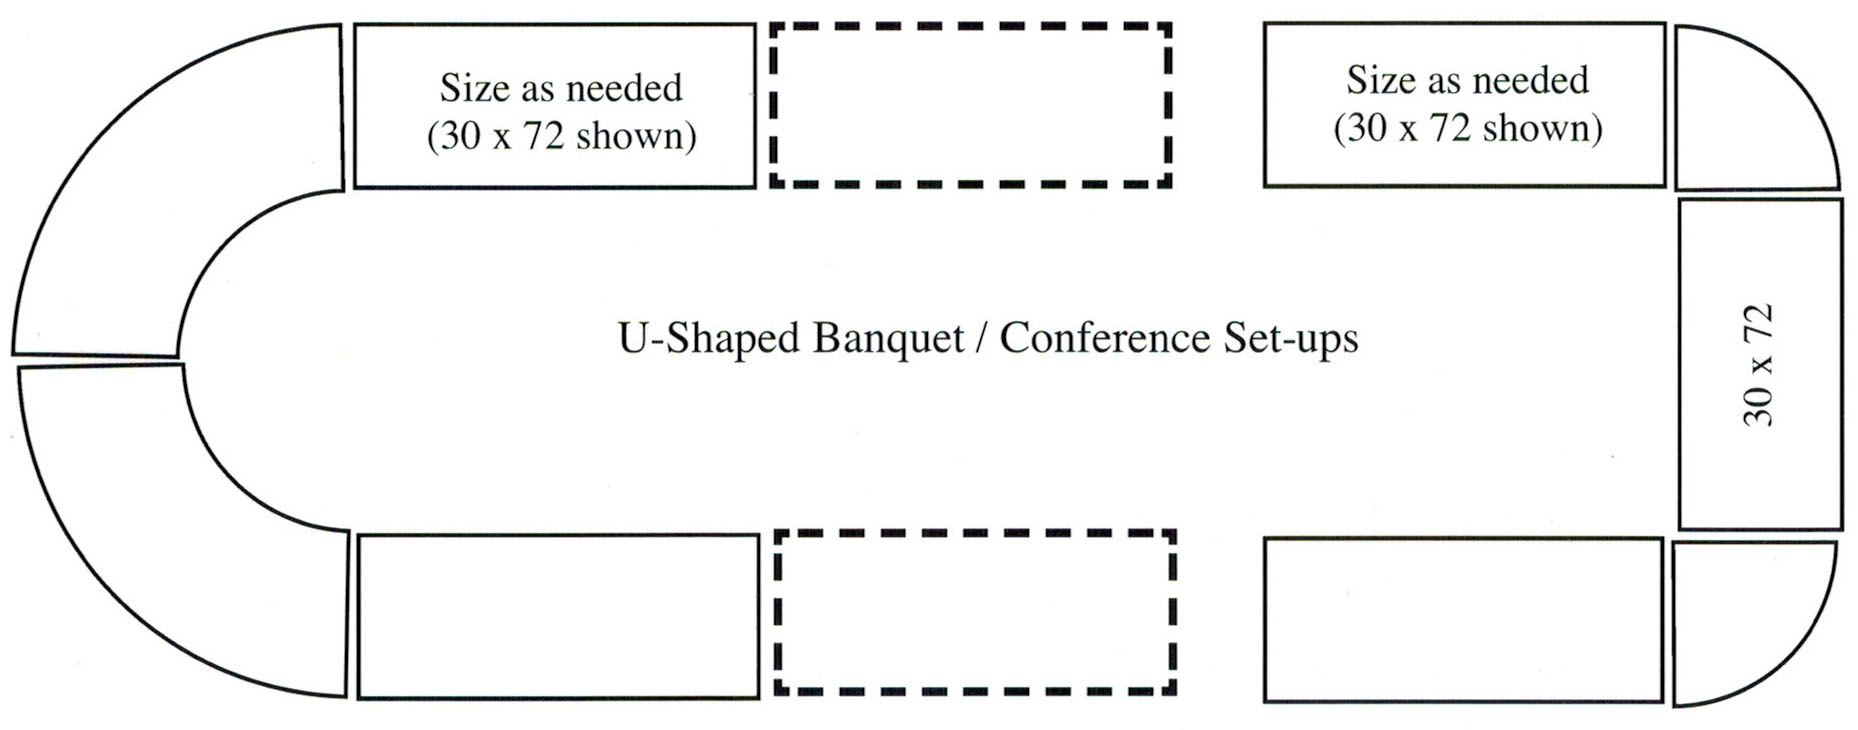 catering buffet set up diagram 2003 dodge ram wiring how to arrange your area - foldingchairsandtables.com